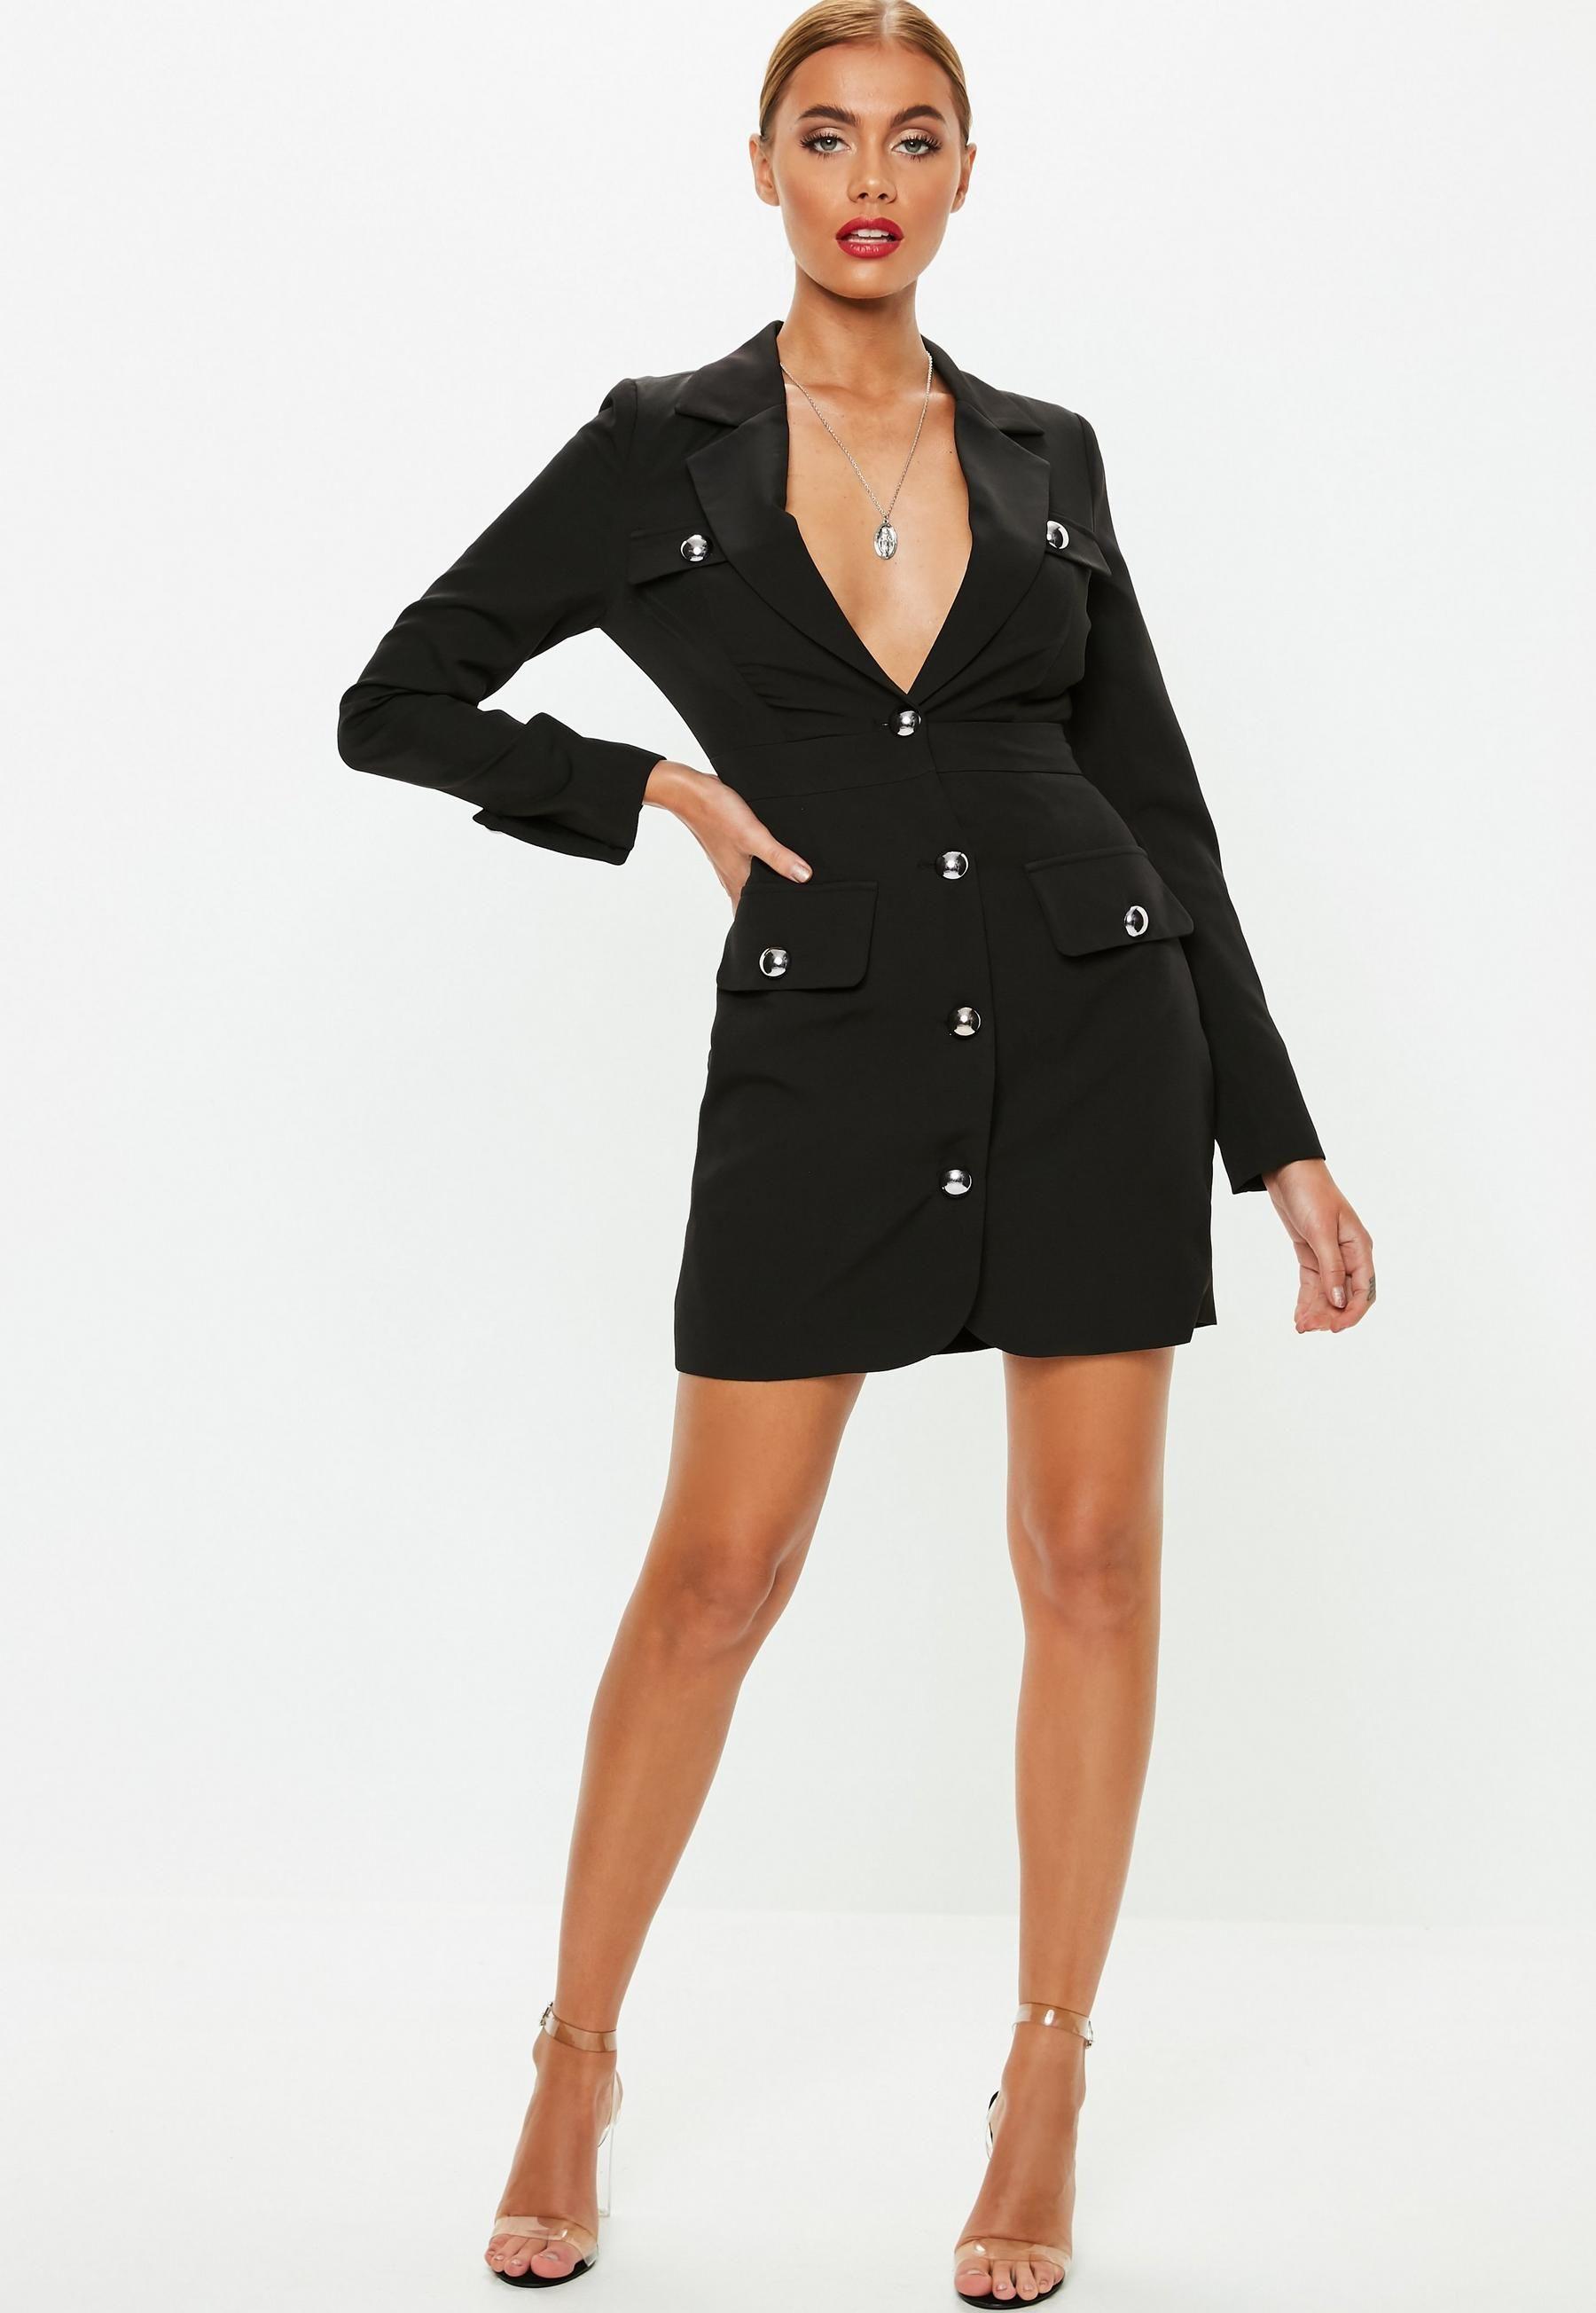 42+ Blazer style crossover dress ideas in 2021